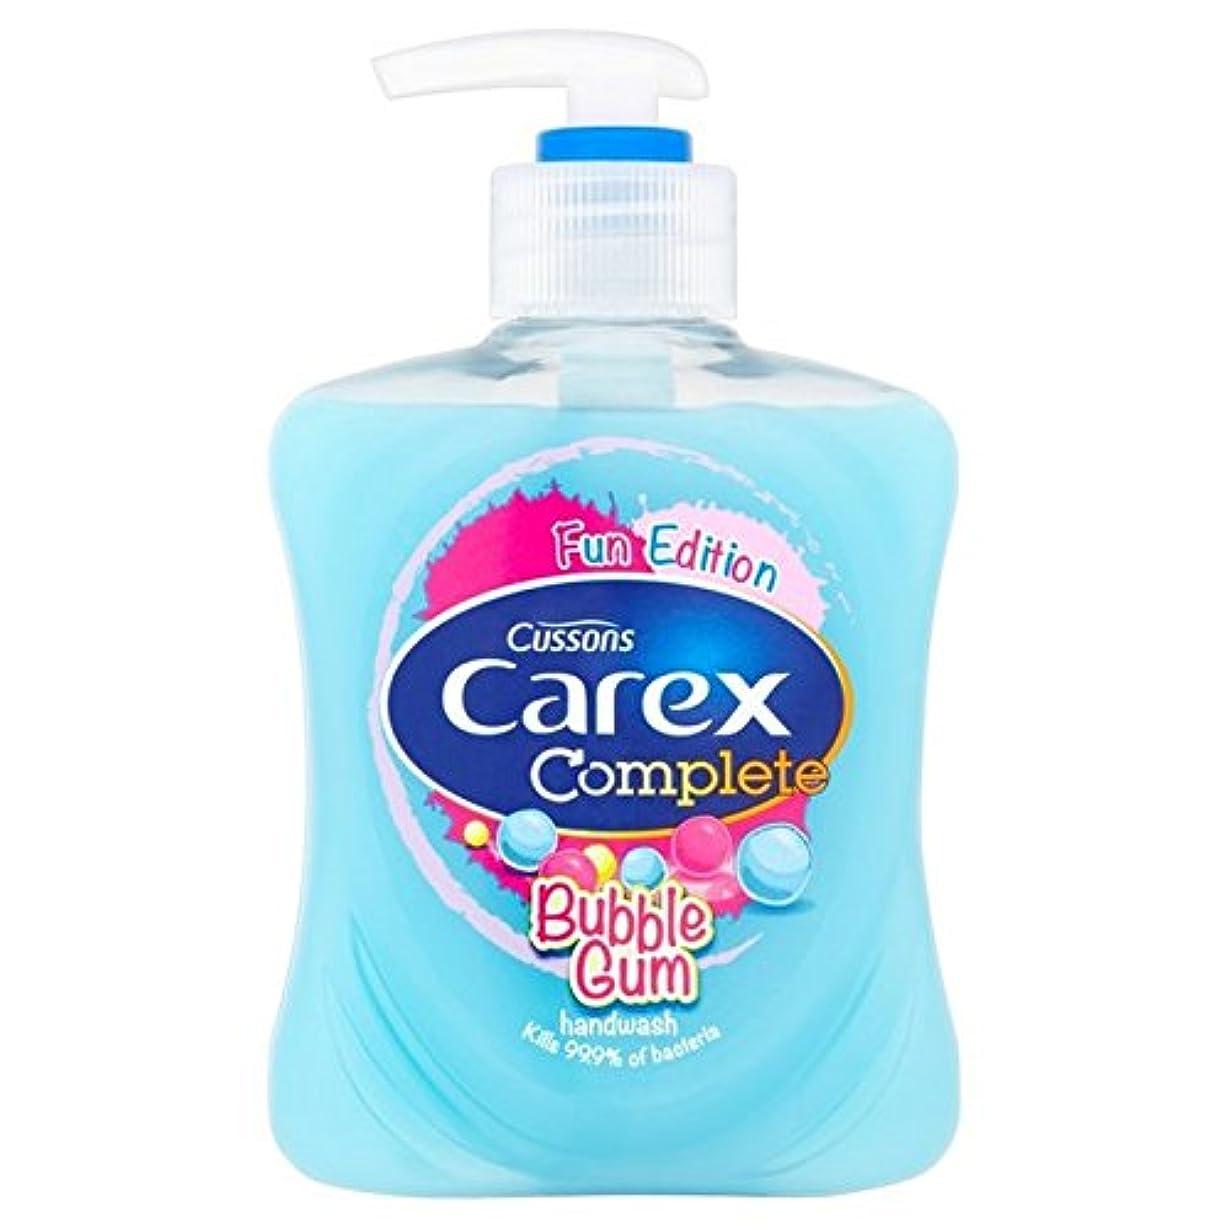 Carex Kids Handwash Bubblegum 250ml - スゲ子供手洗いバブルガムの250ミリリットル [並行輸入品]